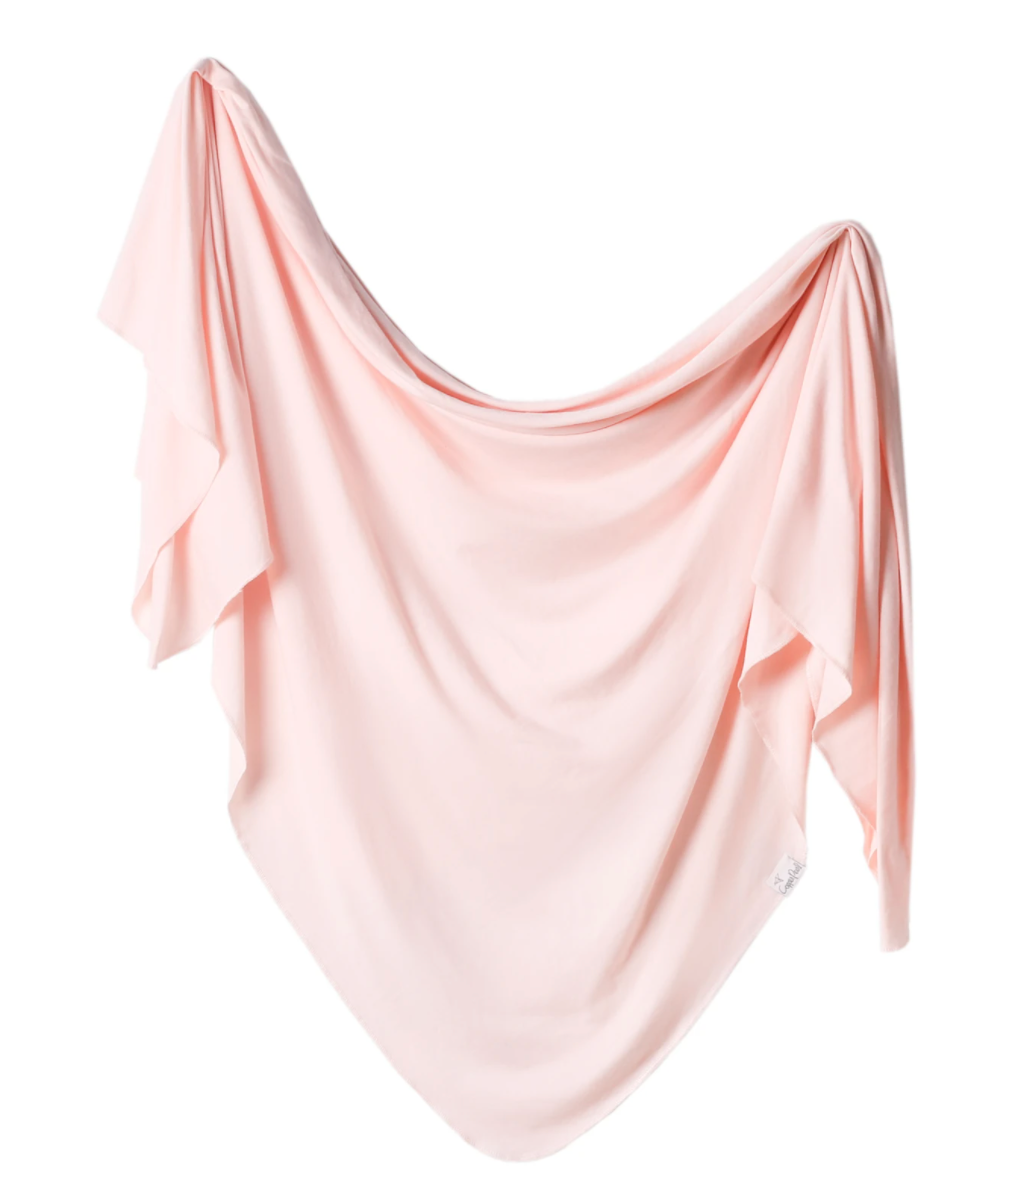 Copper Pearl Knit Swaddle Blanket - Blush